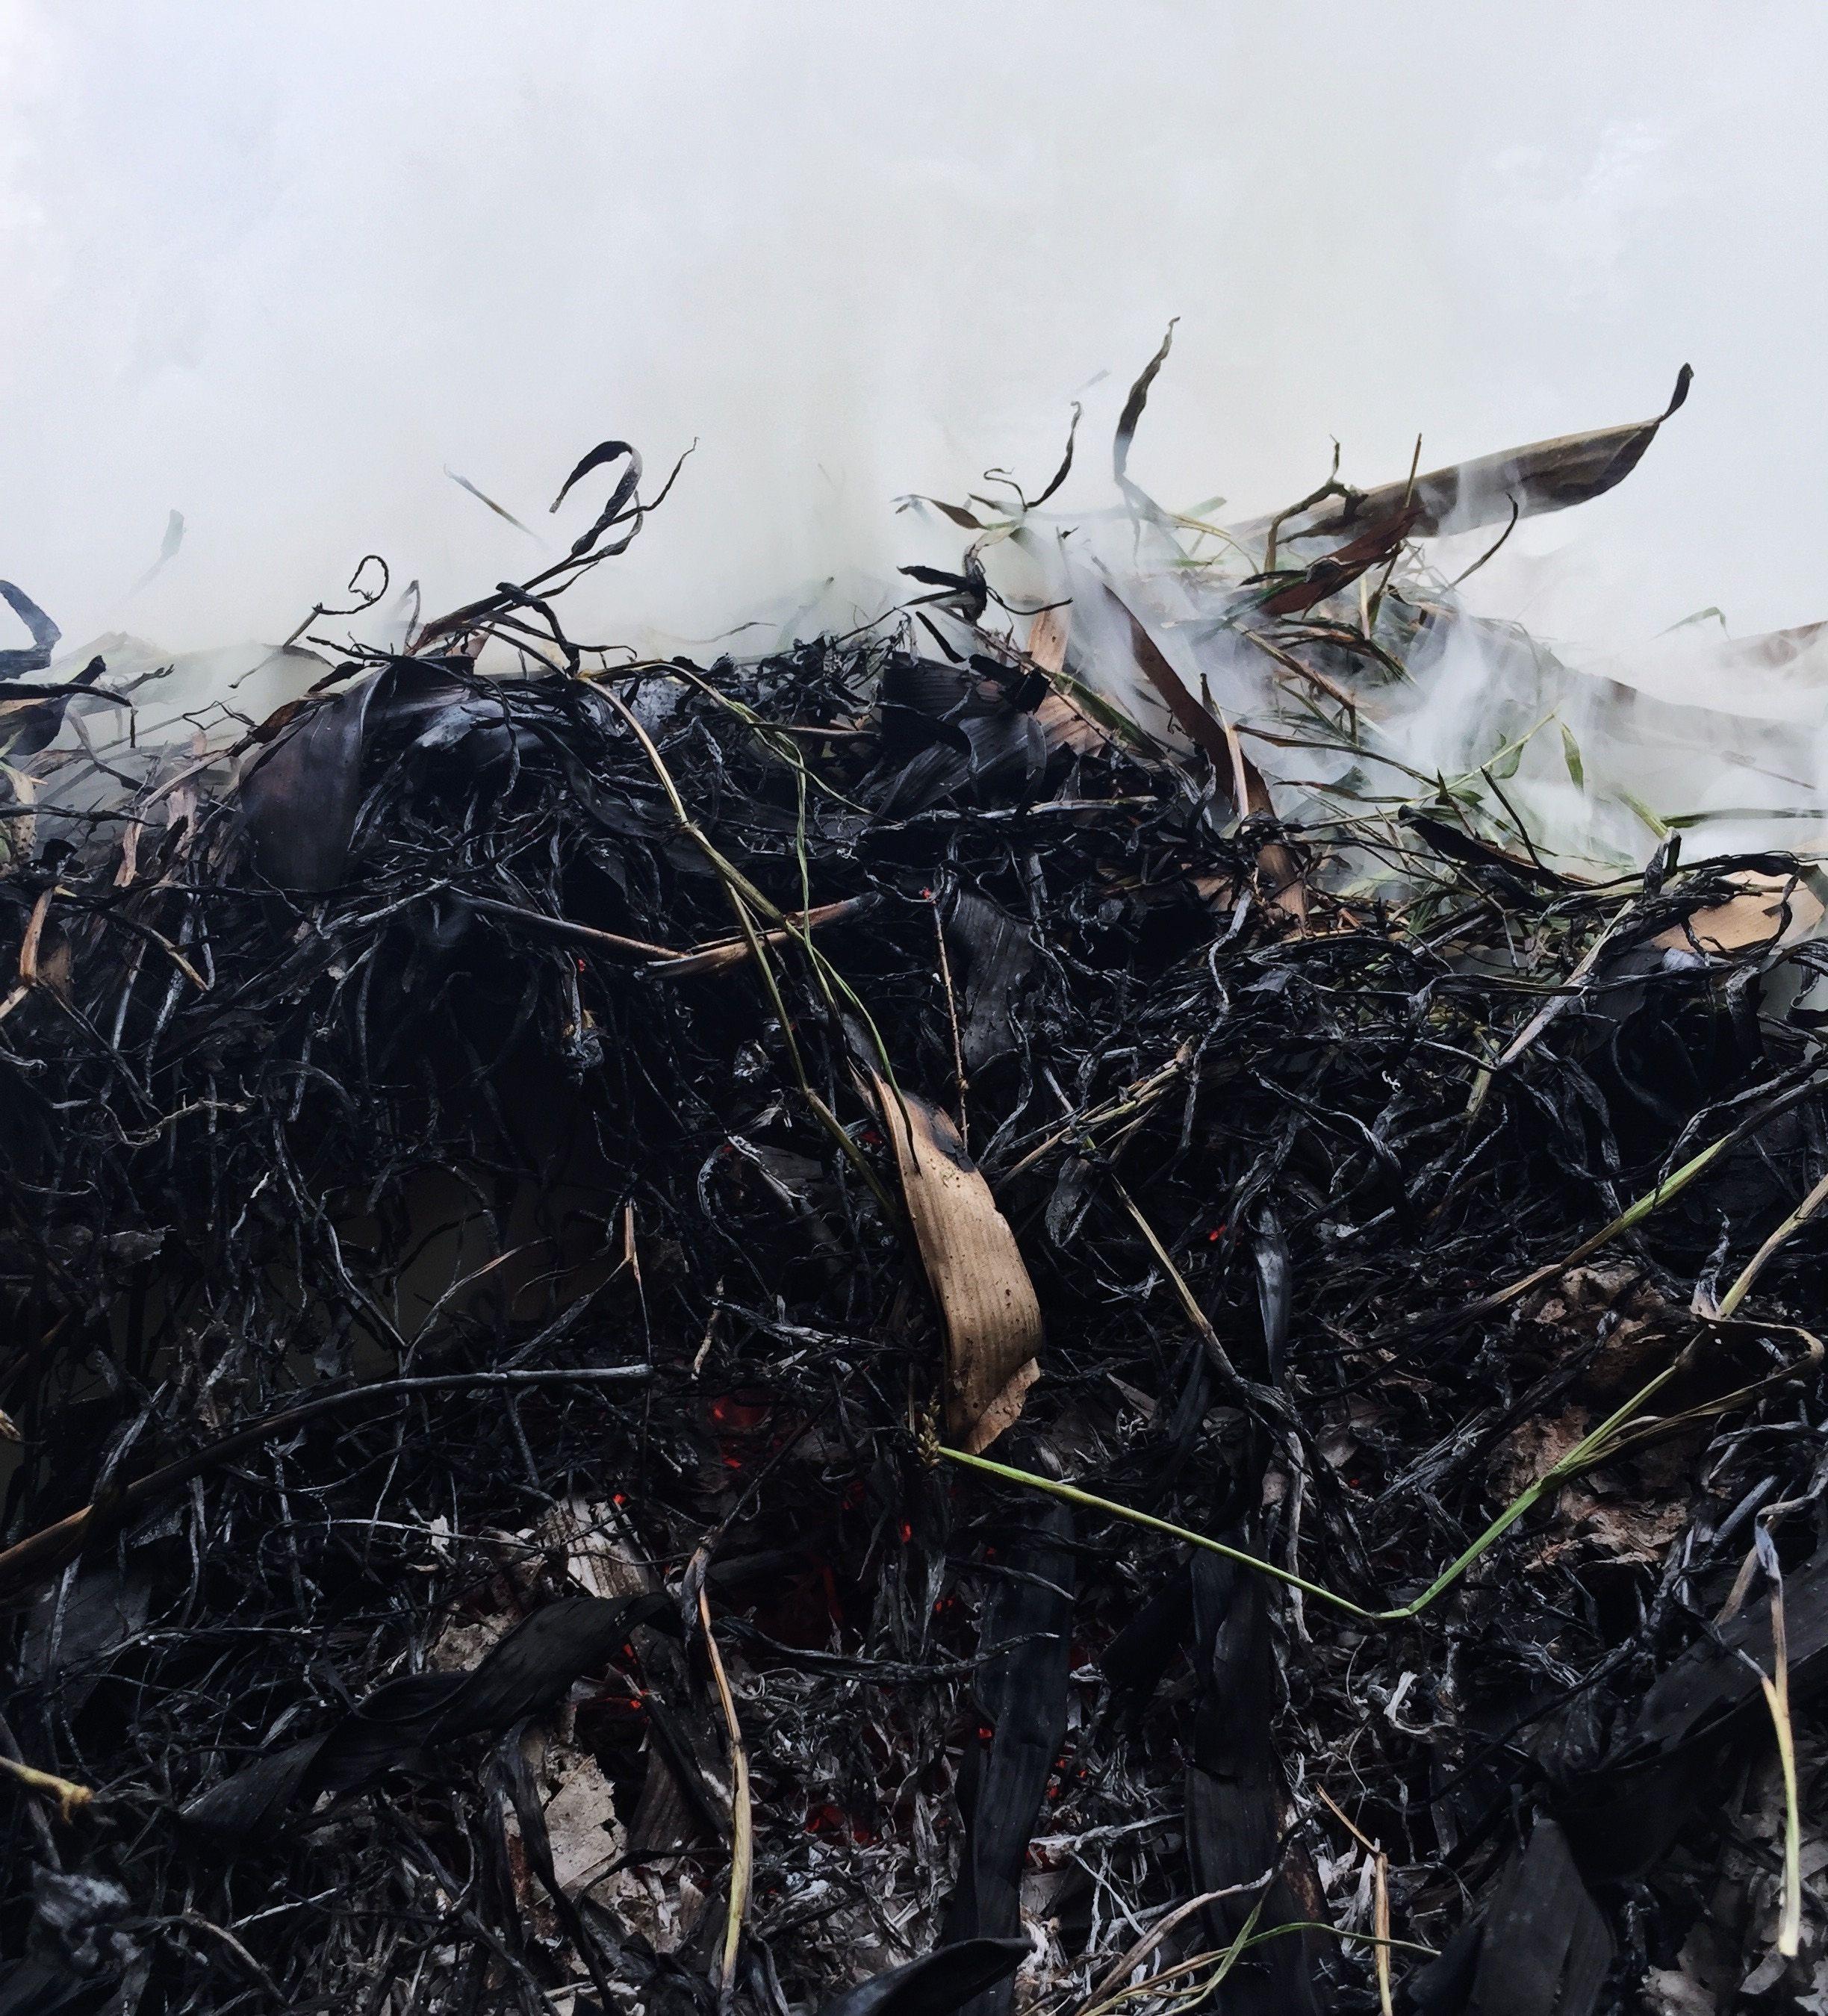 Compost orgánico ecológico